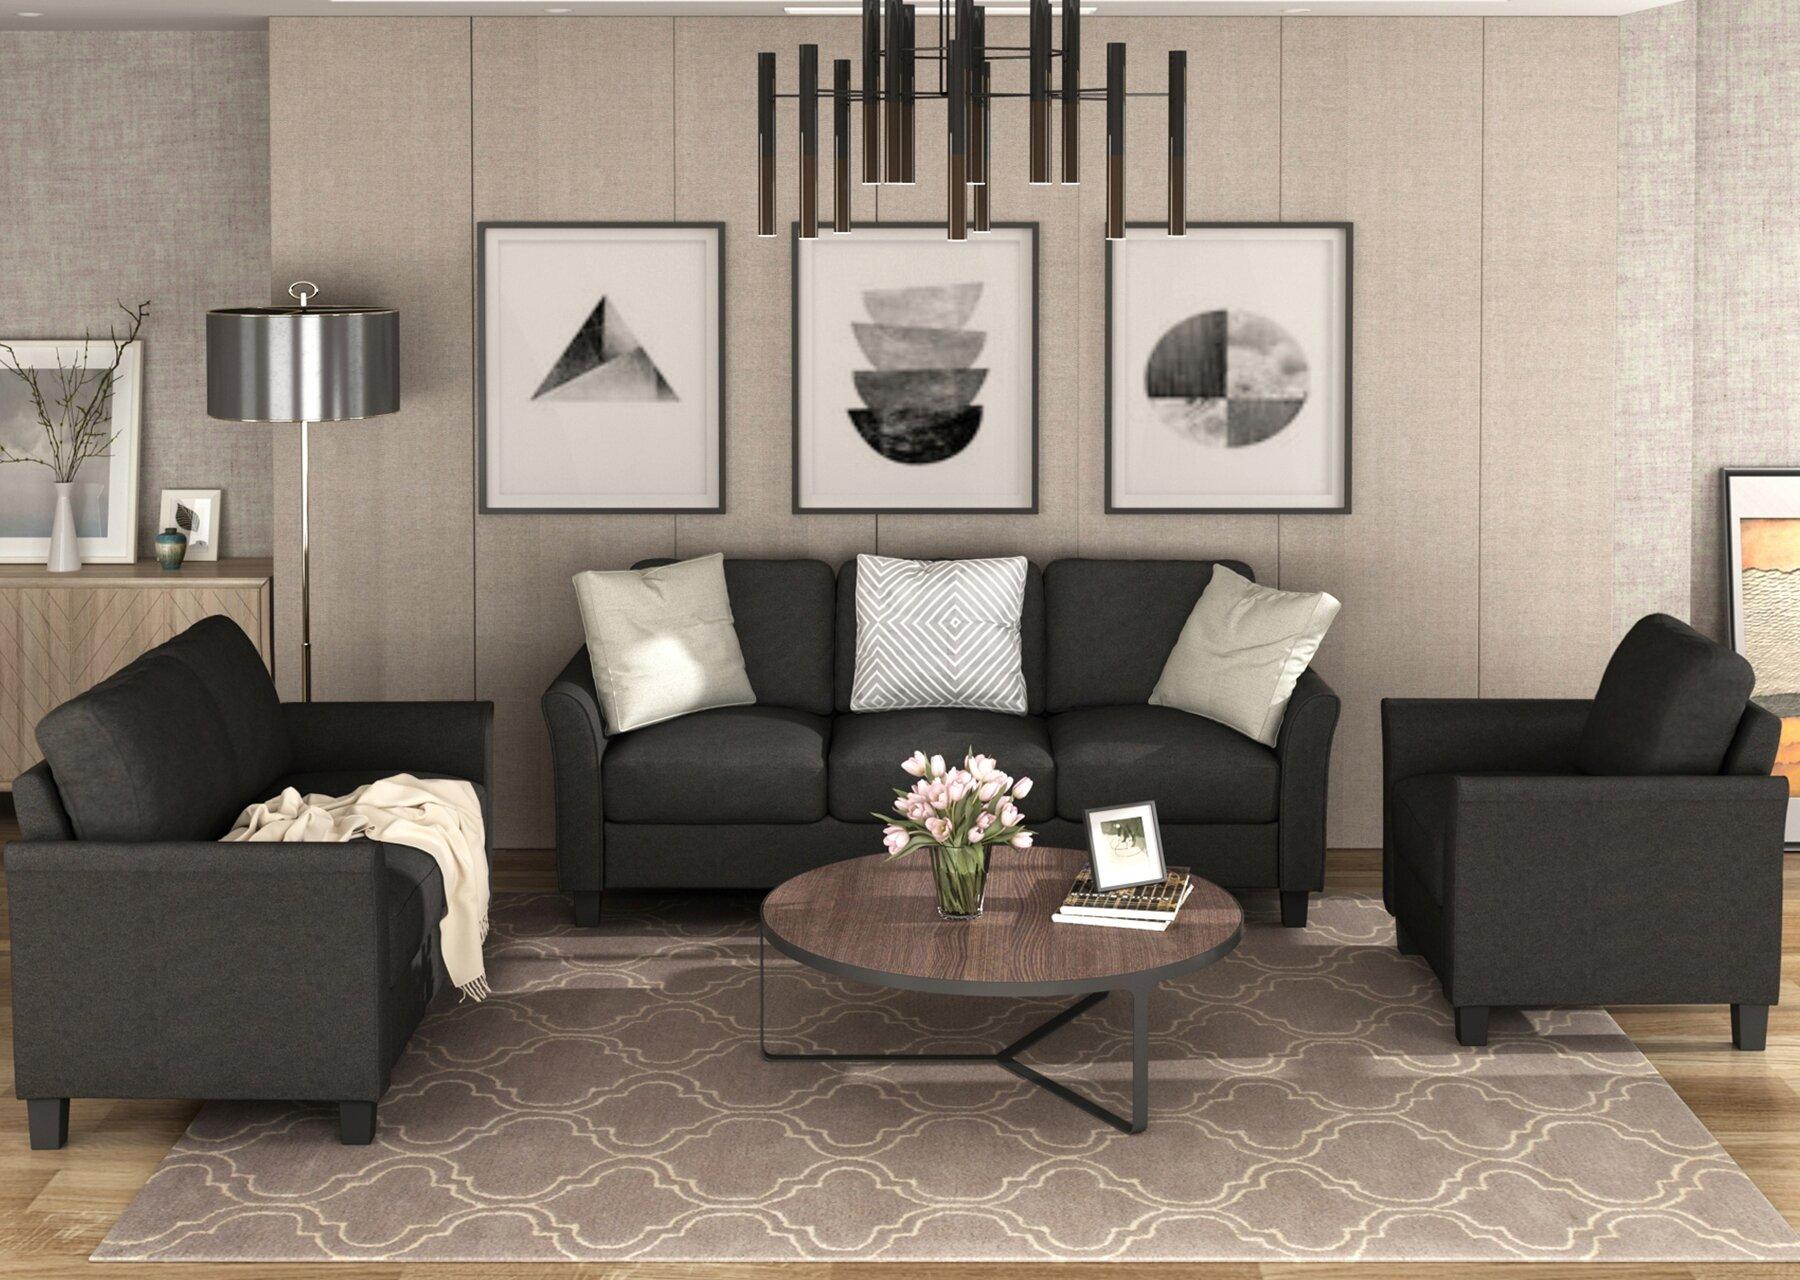 Living Room Sets Furniture Armrest Sofa Single Chair Sofa Loveseat Chair  11-seat Sofa (chairloveseat Chair&11-seat Sofa, Black)